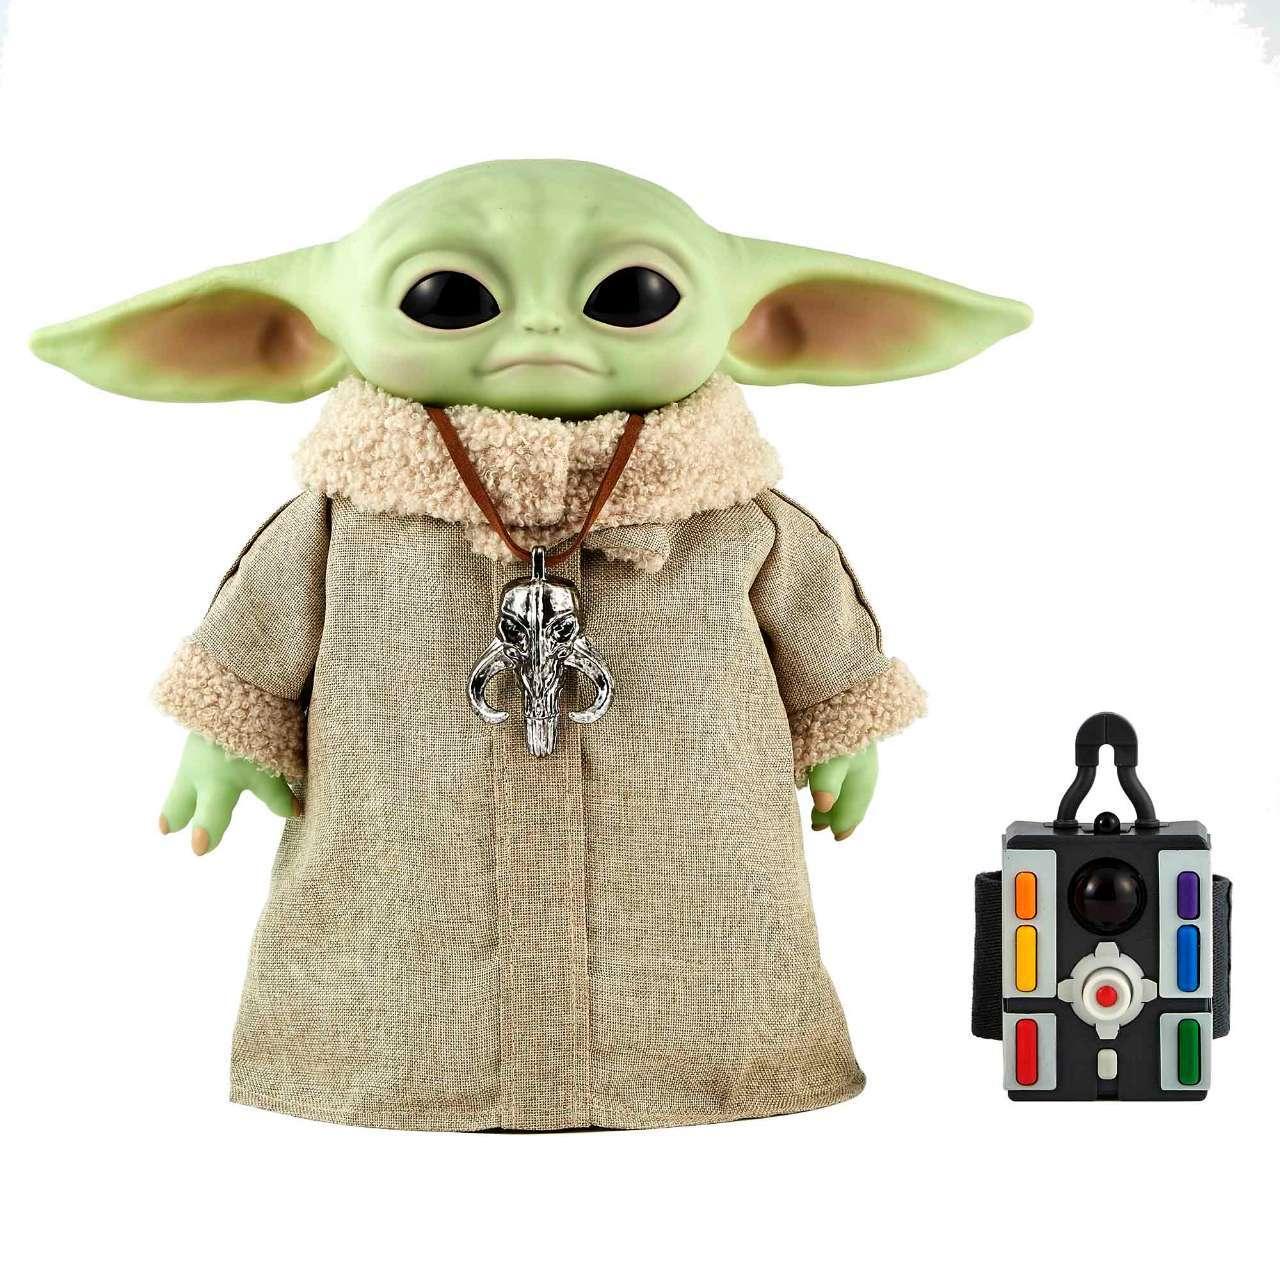 Star Wars Mandalorian The Child Baby Yoda Animatronic Toy Disney Hasbro IN HAND